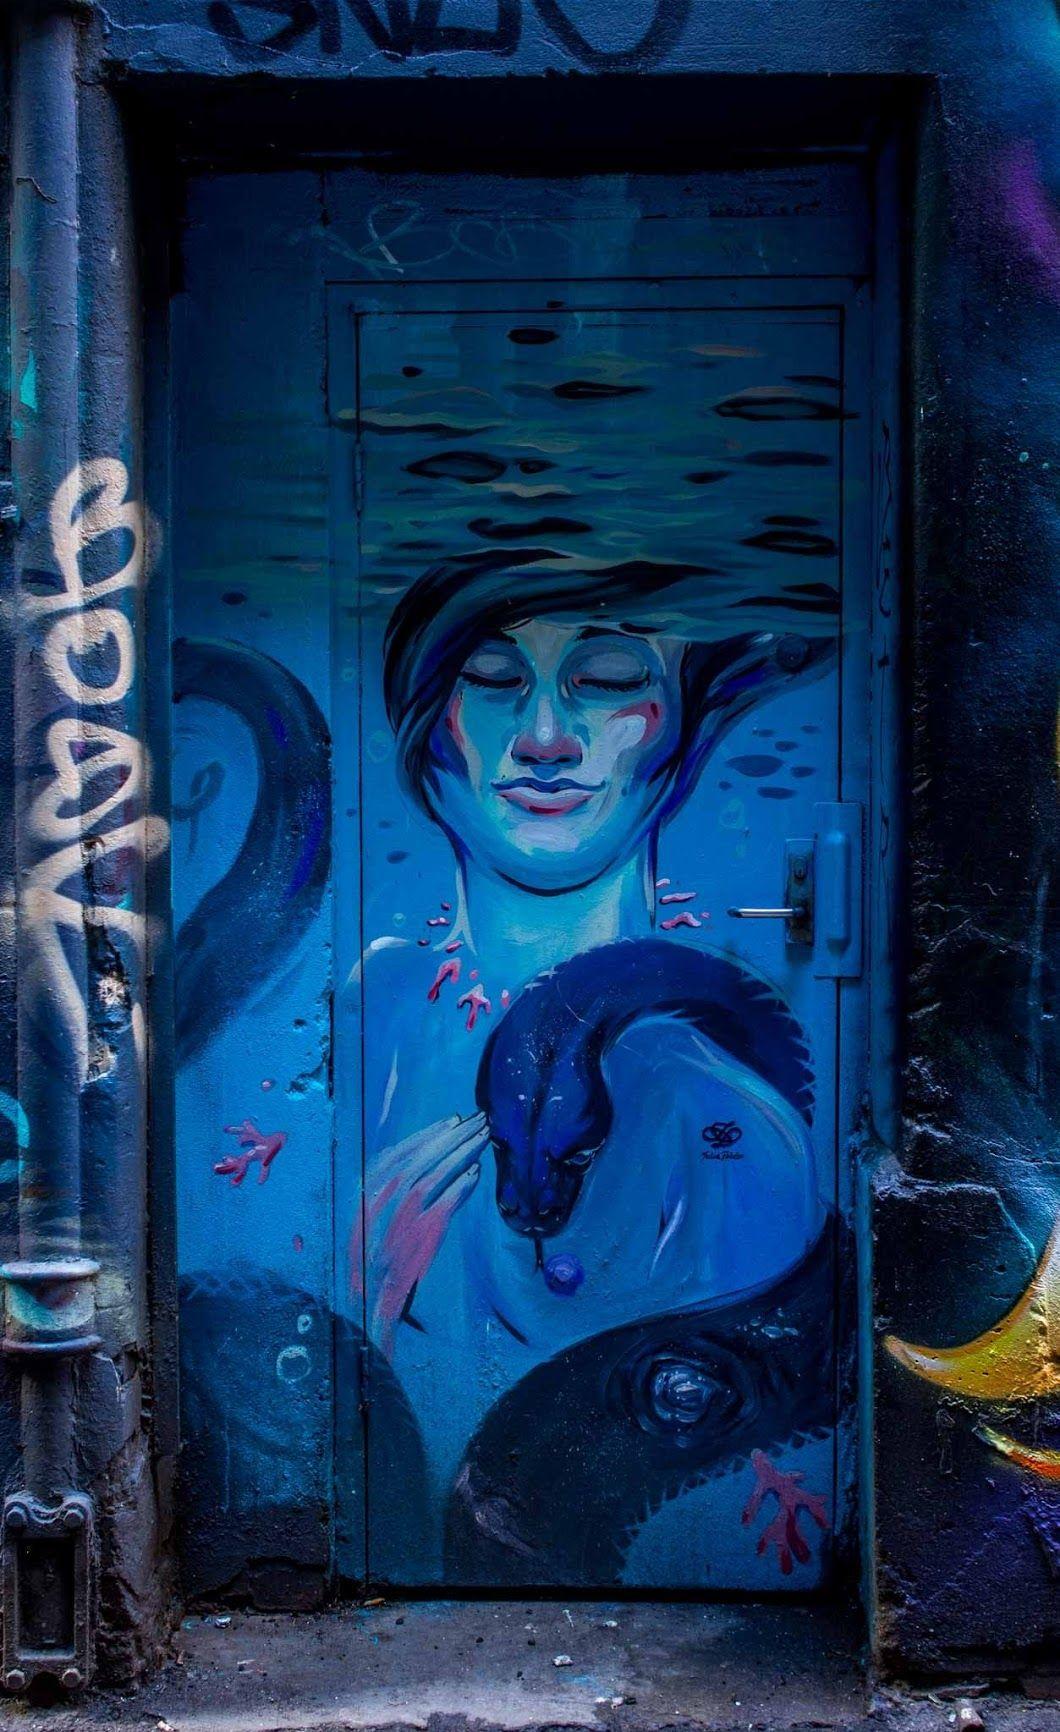 Great doorway in Flinders Crt Melbourne ##graffiti ##art ##streetart ##melbourne ##MOS2016 ##meetingofstyles - Tony P - Google+